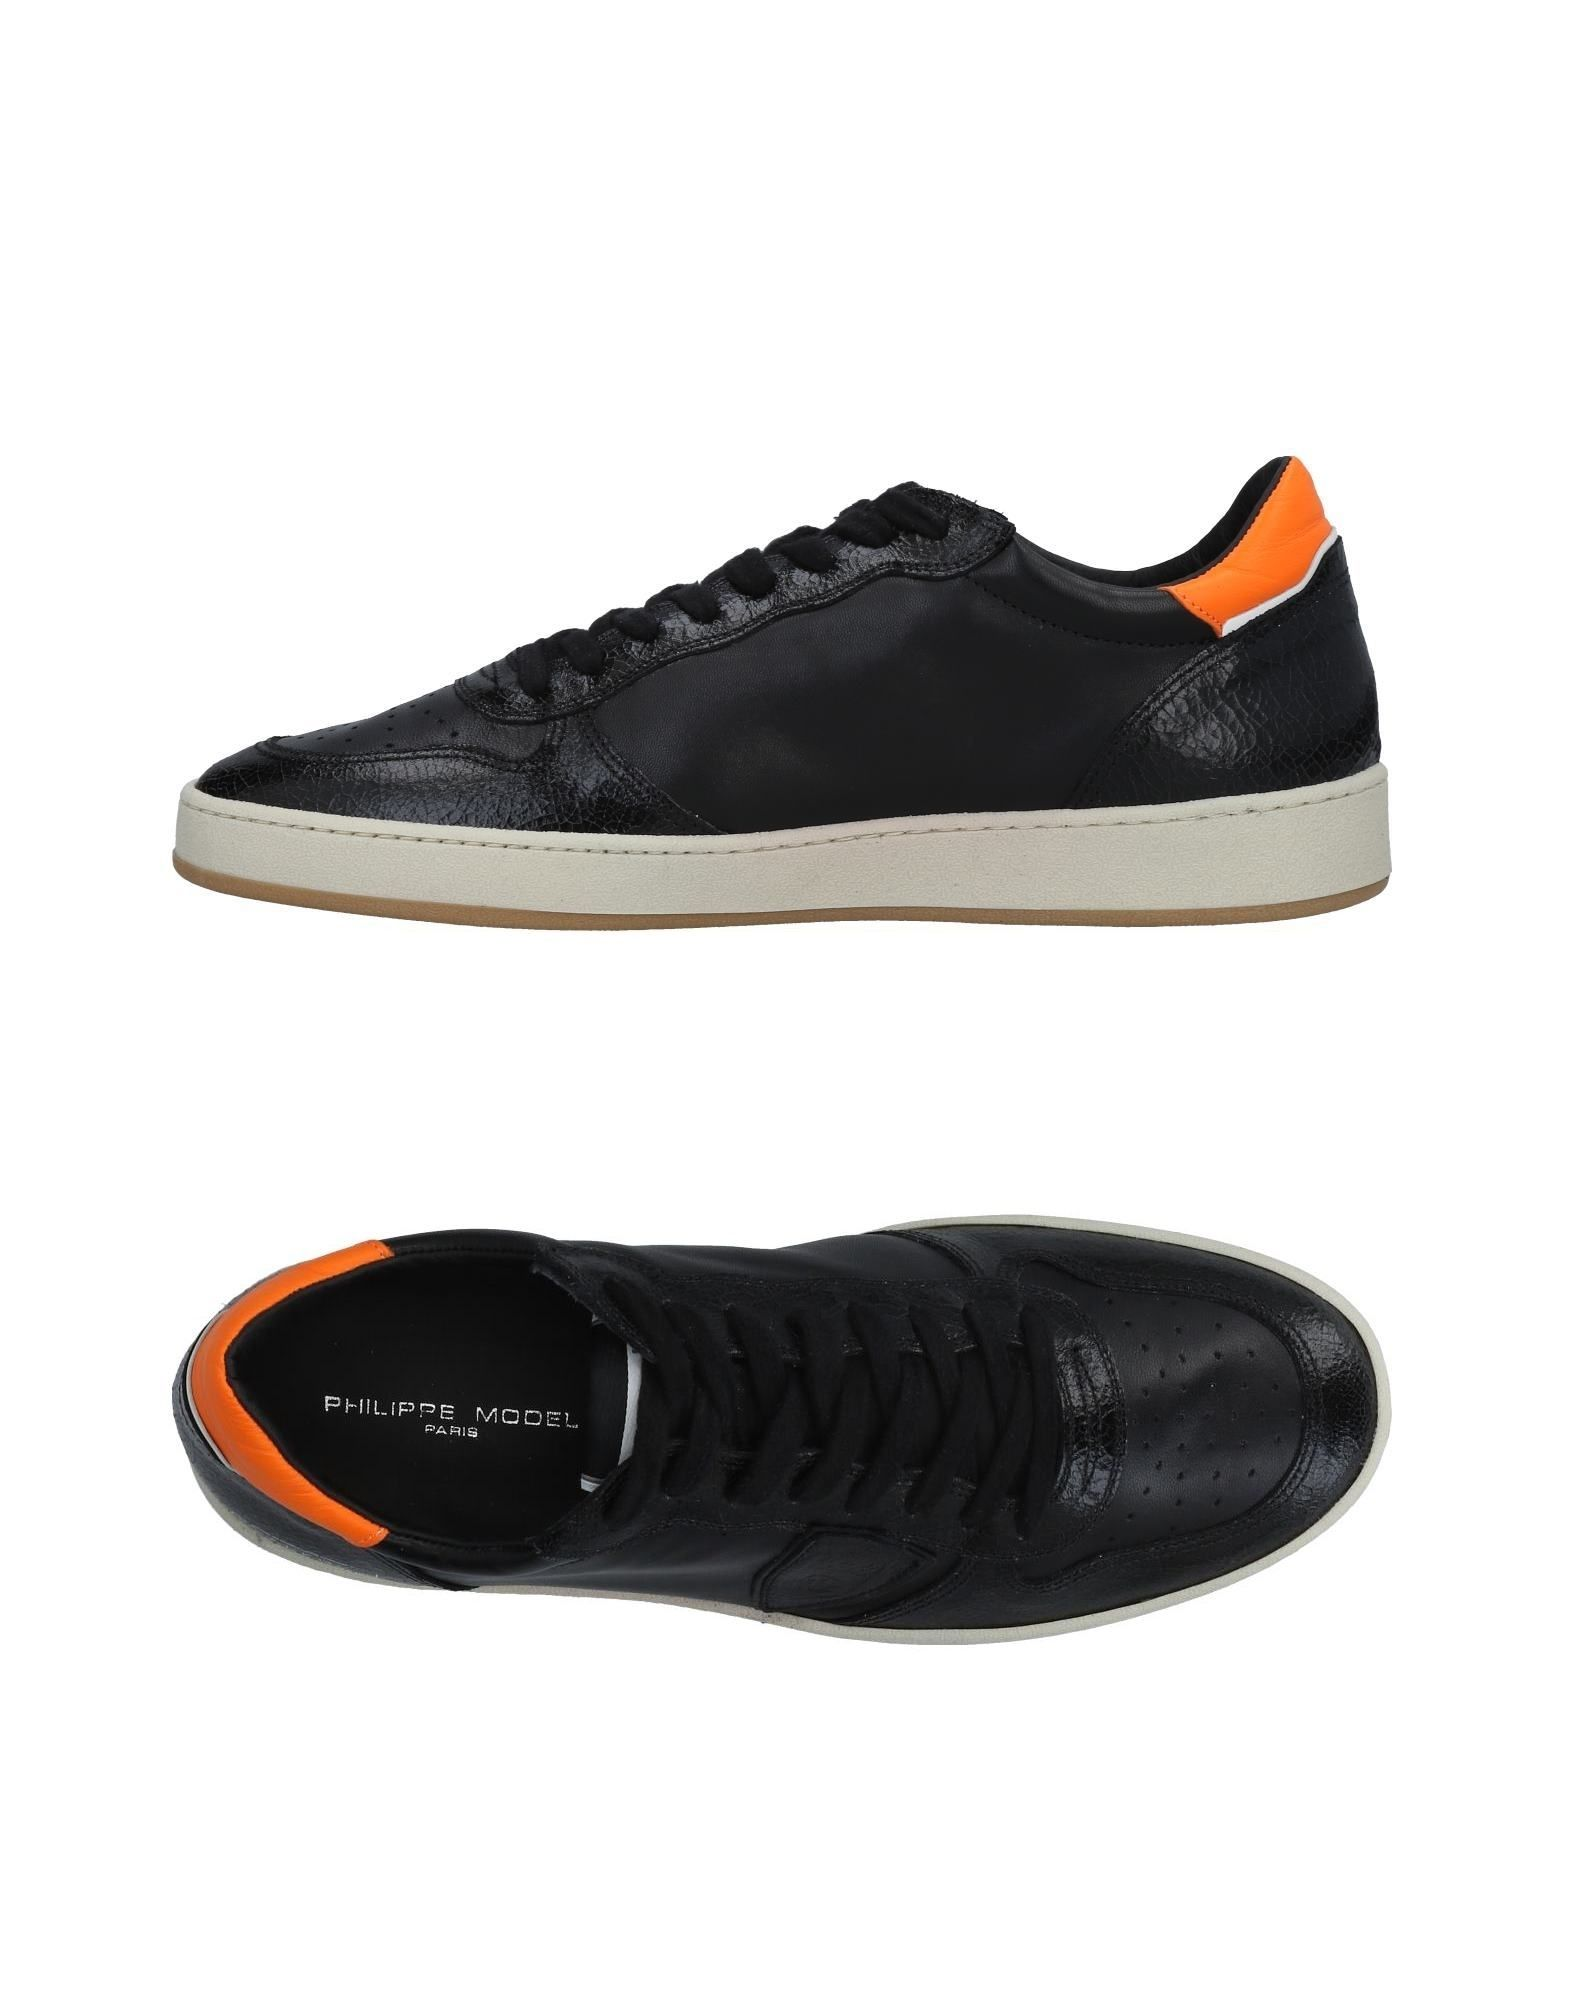 Philippe Model Sneakers Herren  11444313MV Gute Qualität beliebte Schuhe